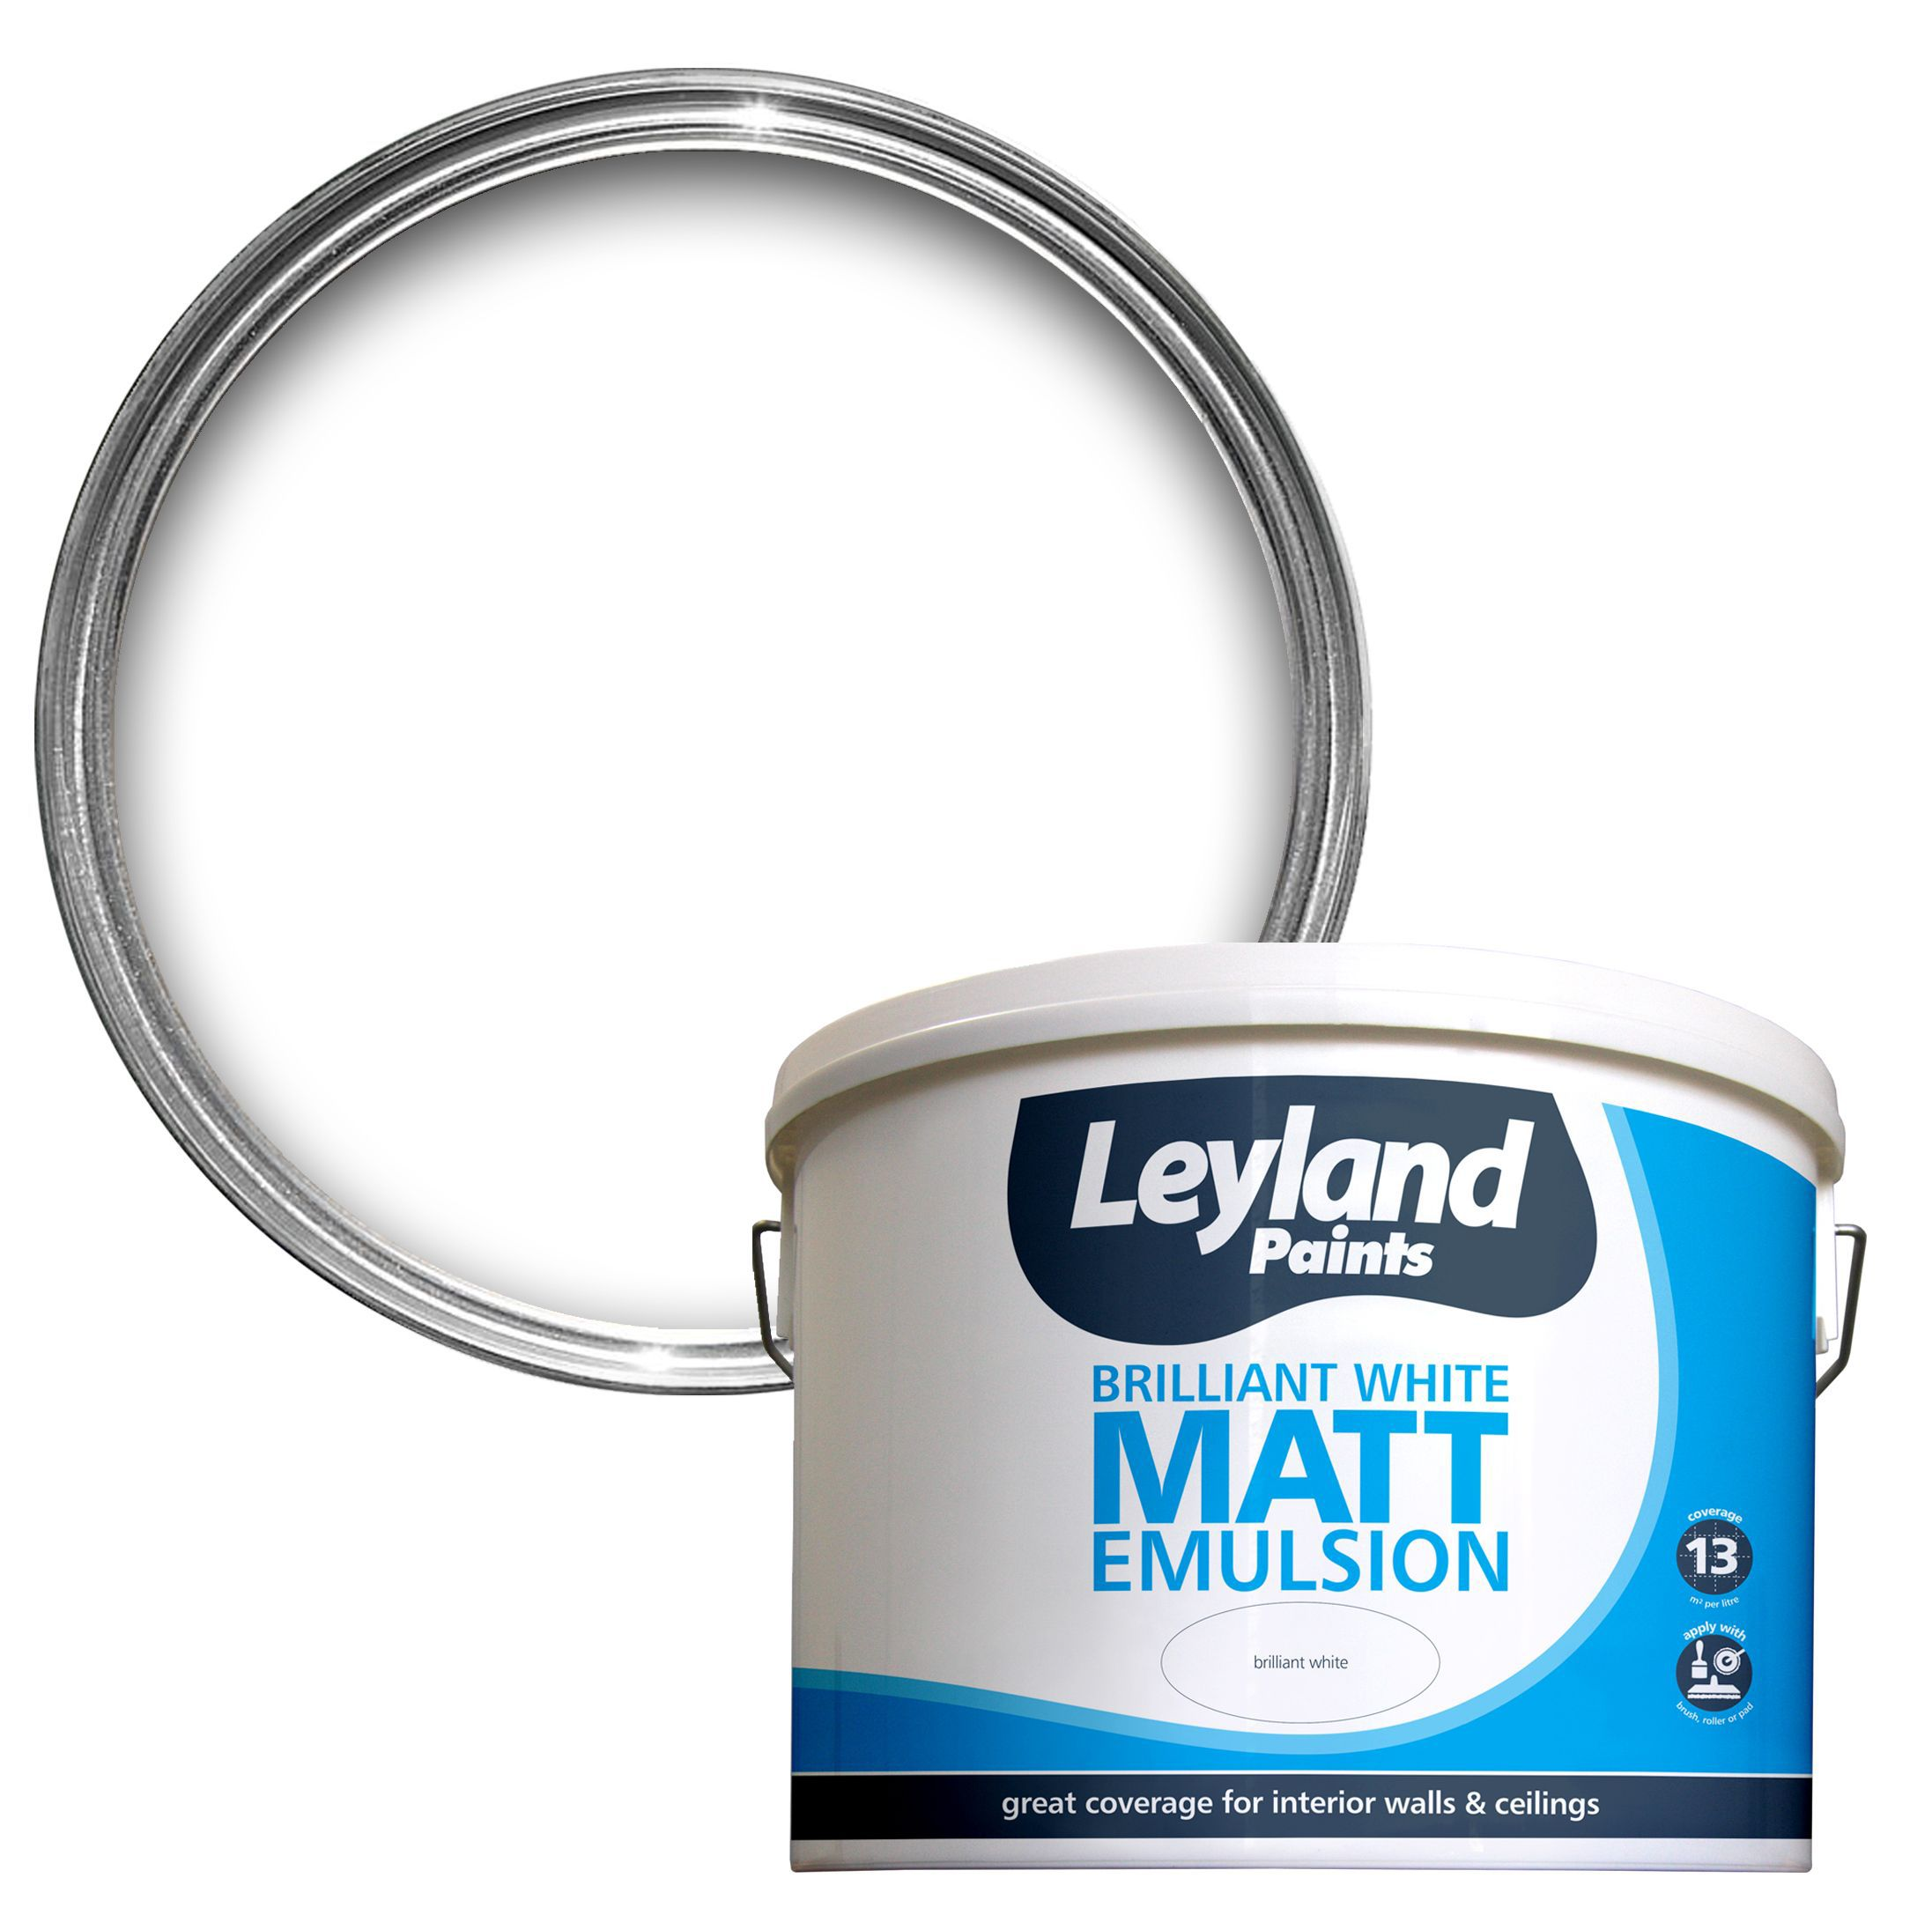 Leyland Pure Brilliant White Matt Emulsion Paint 10l Departments Diy At B Q